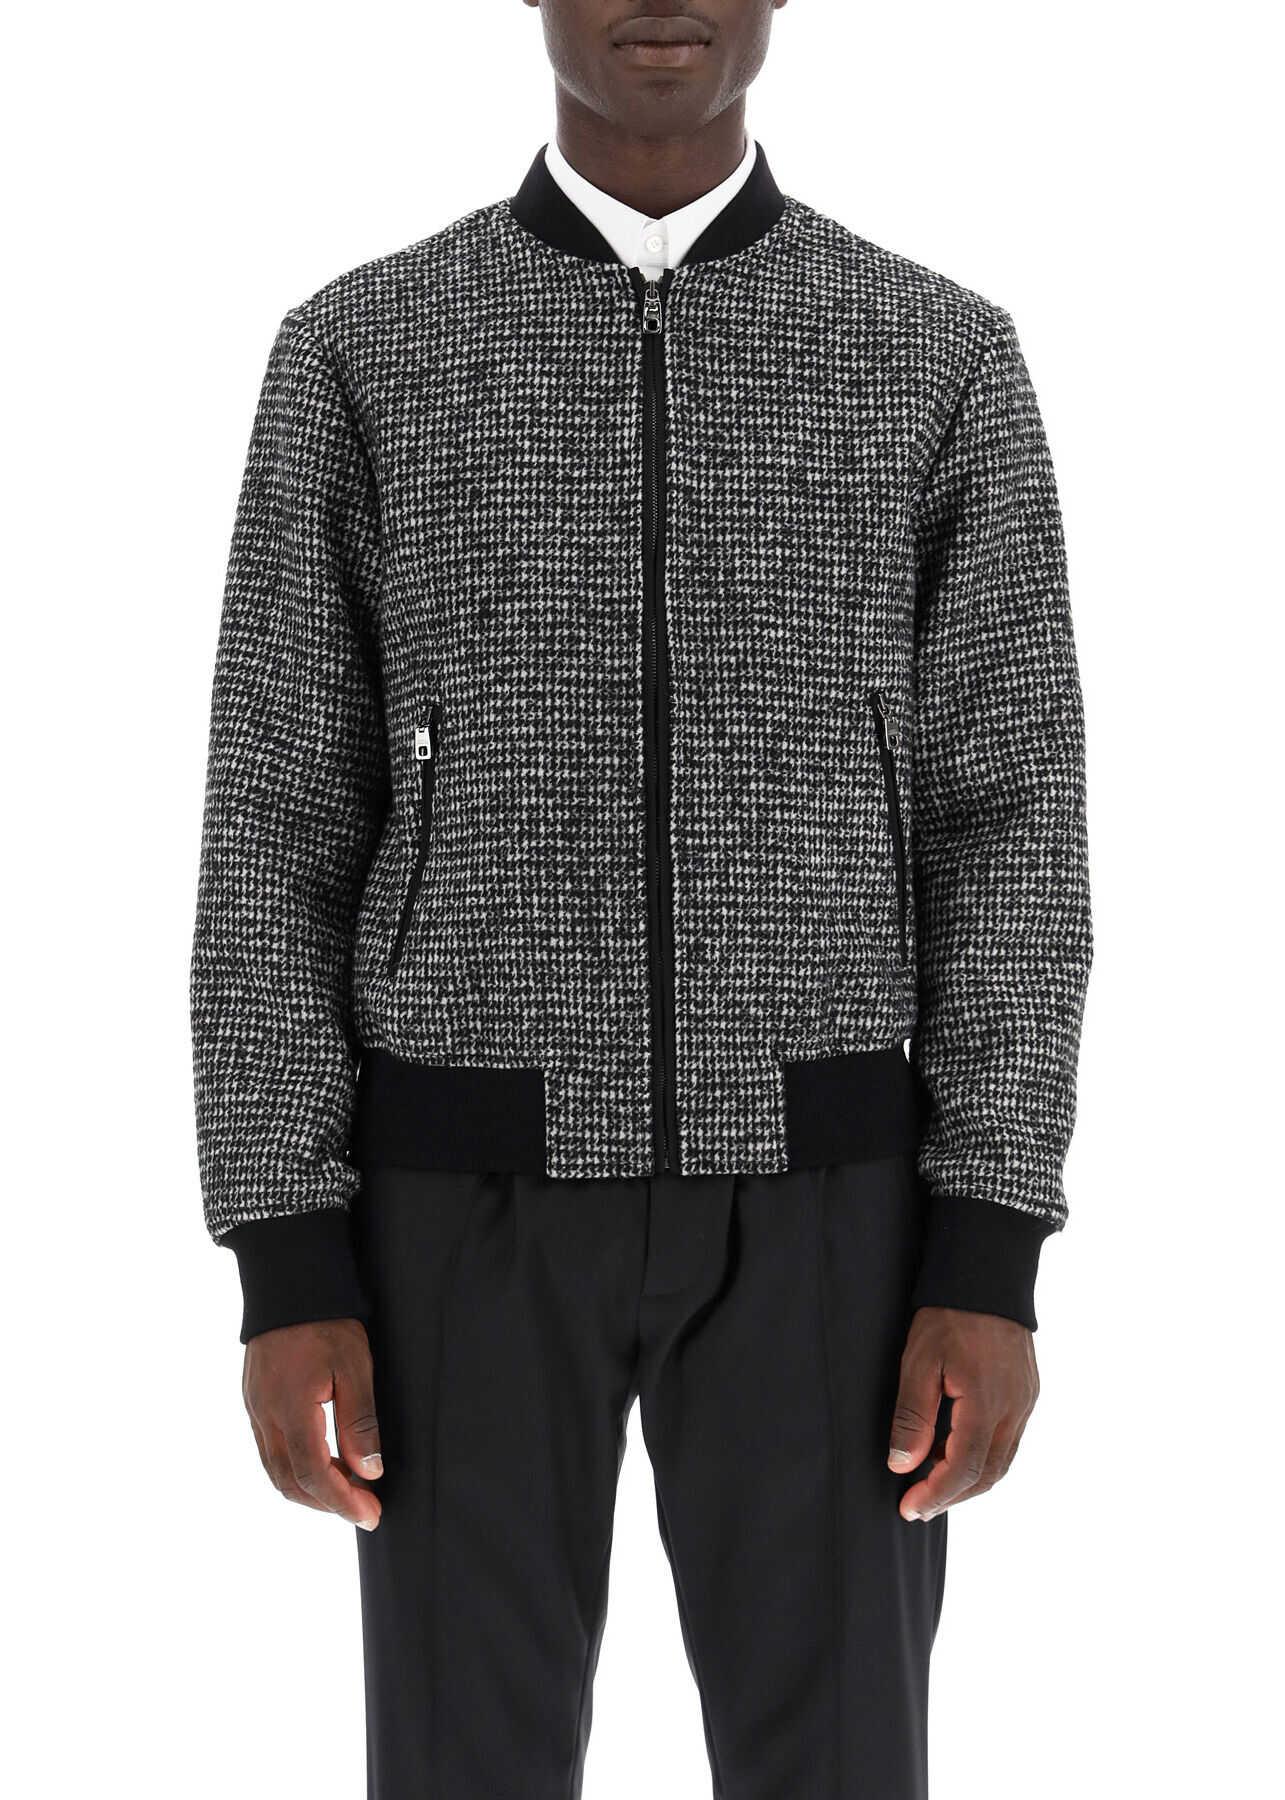 Dolce & Gabbana Micro Houndstooth Bomber Jacket FANTASIA NON STAMPA imagine